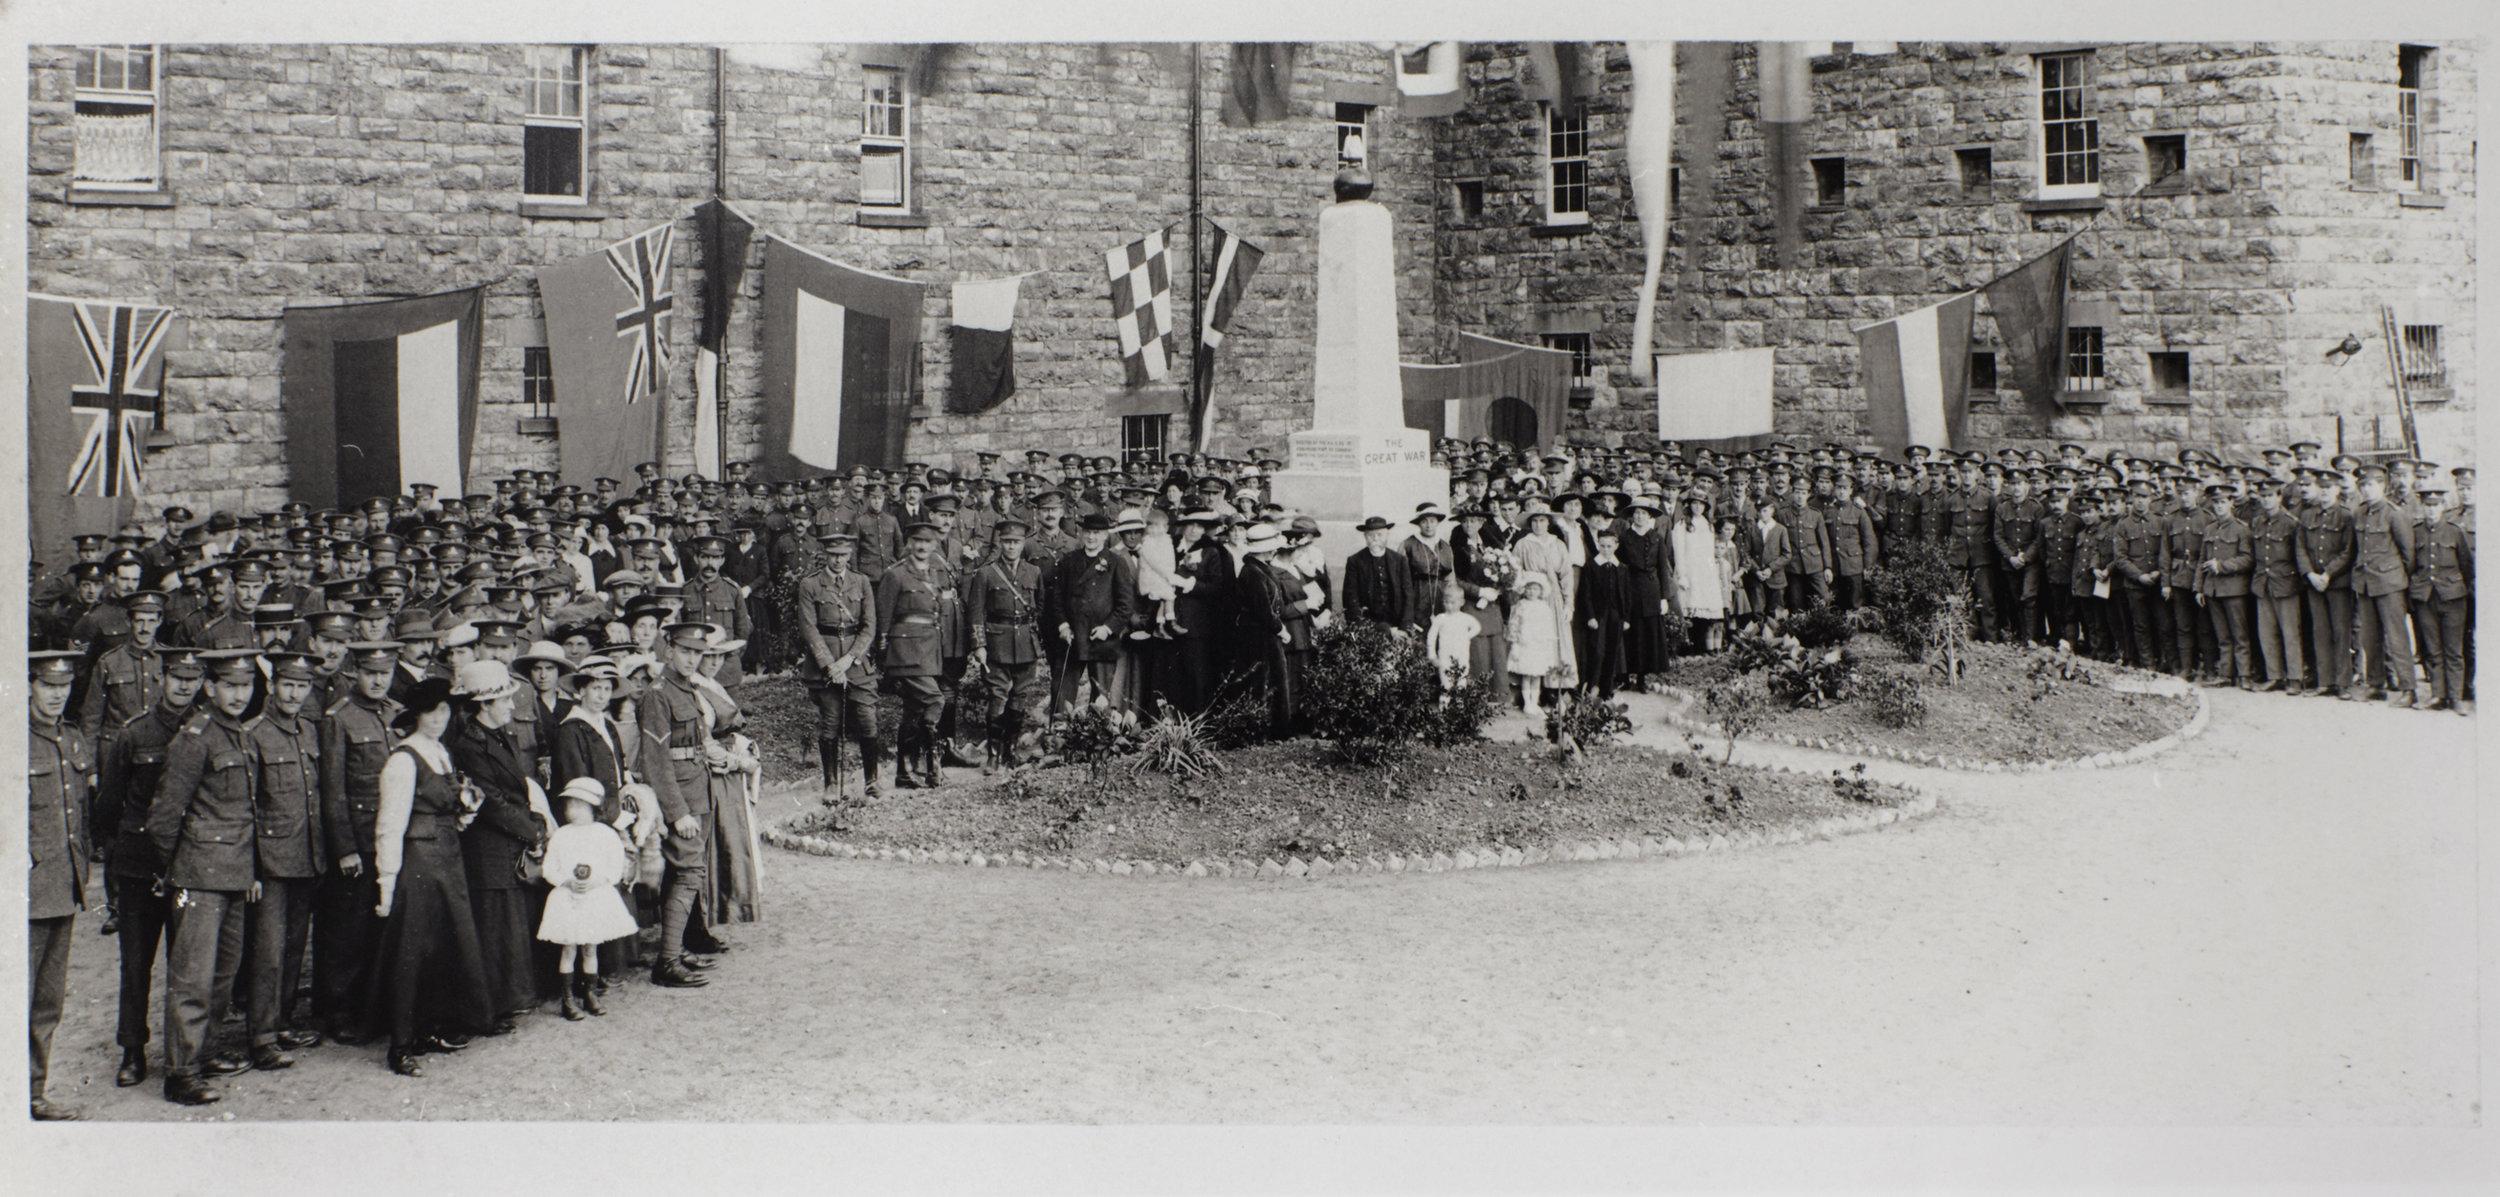 Digital_Archives_Photo_ROYAL_ARTILLERY_OFFICERS_1886_01.jpg